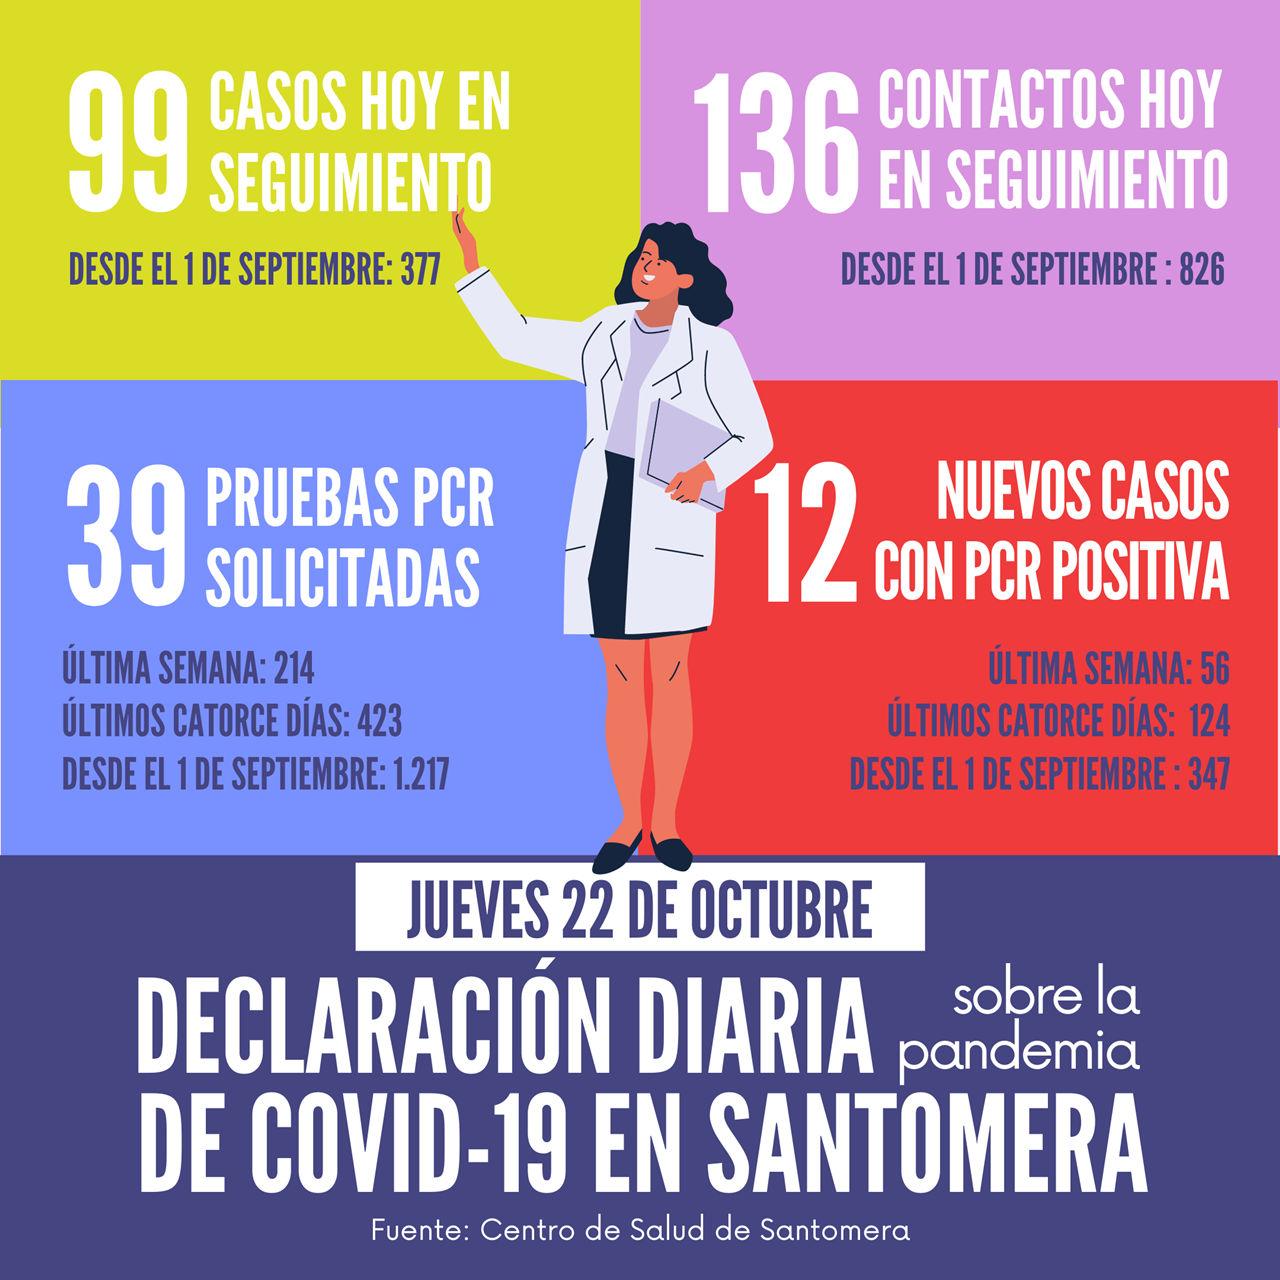 20201022_Datos COVID-19 Santomera